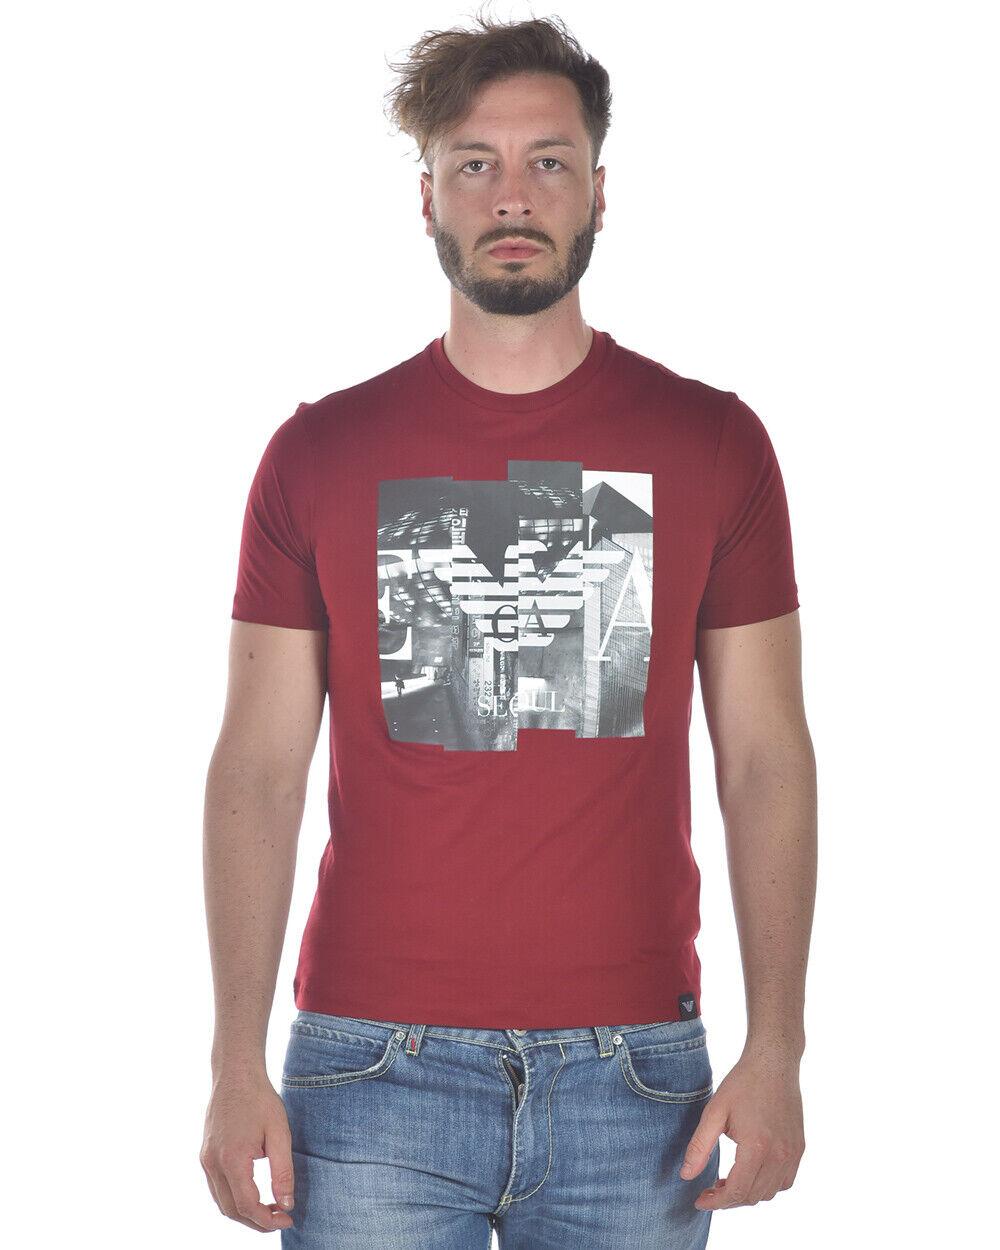 Emporio Armani T hemd schweißhemd baumwolle Man rot 3Z1T751JPZZ 340 Sz S MAKE OFFER